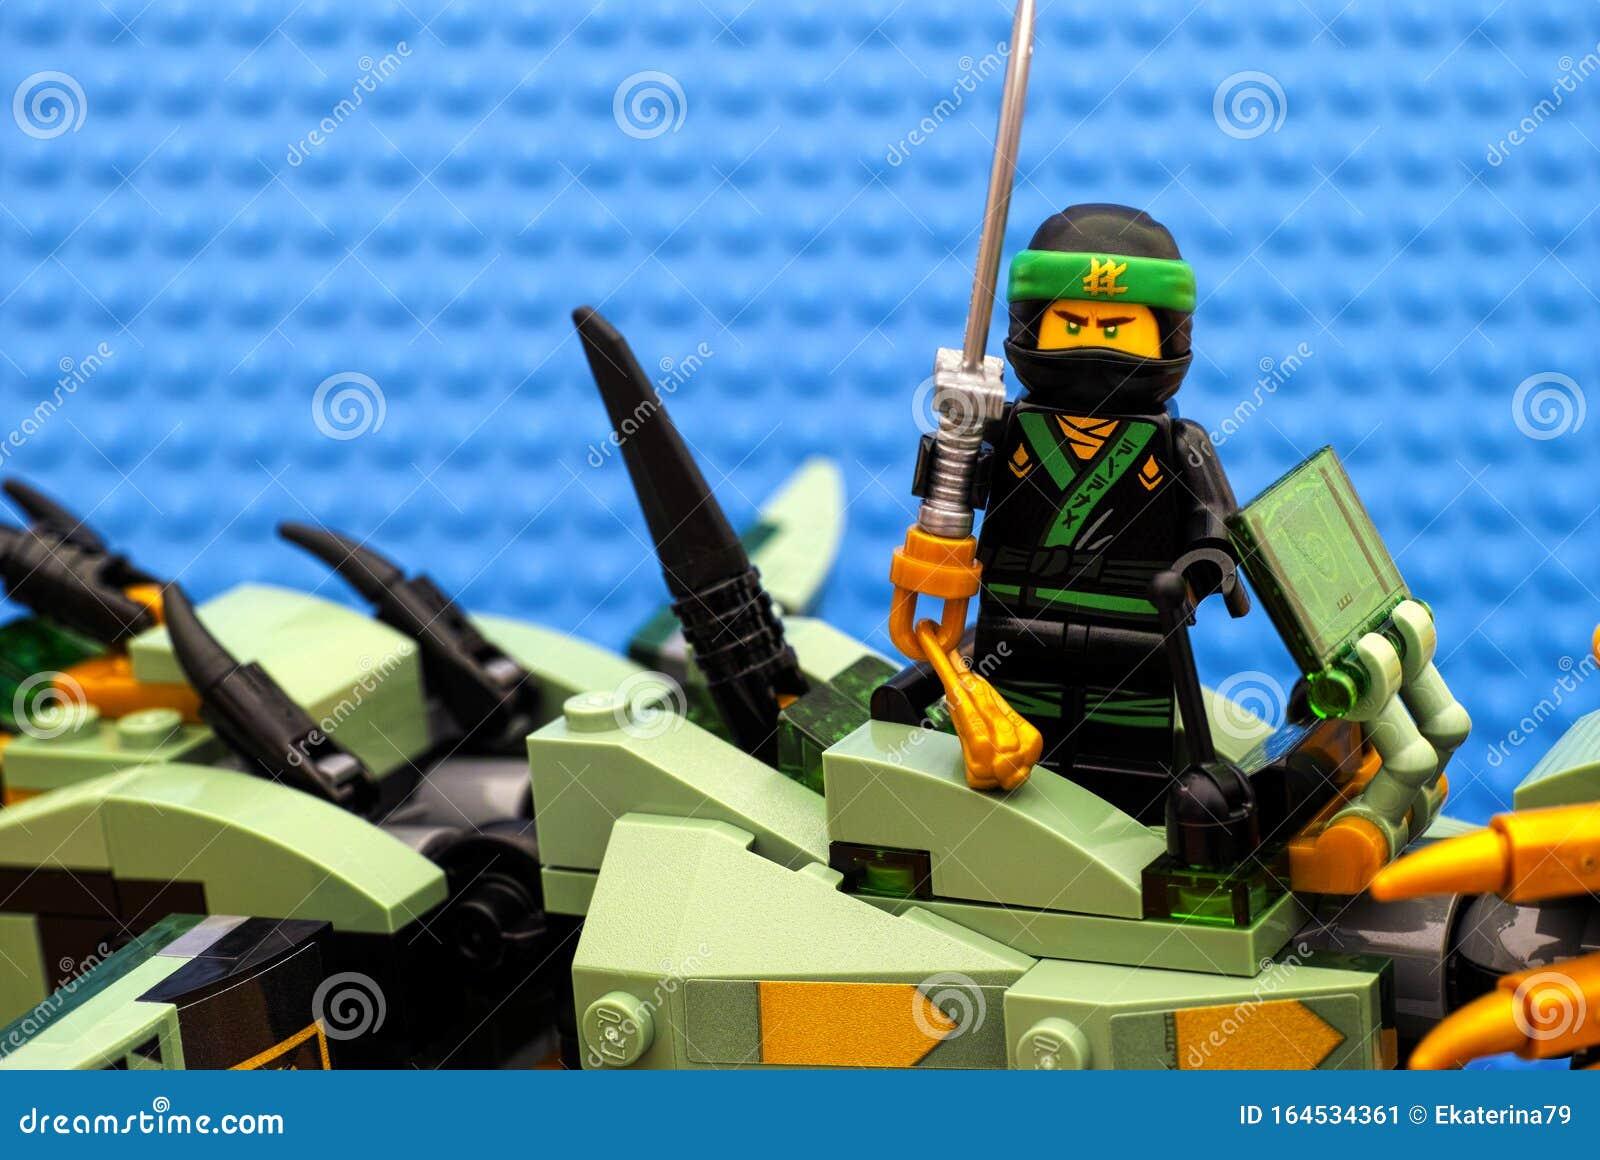 Lego Ninjago Movie The Green Ninja Standing On Green Ninja Mech Dragon Editorial Photo Image Of Fight Mini 164534361